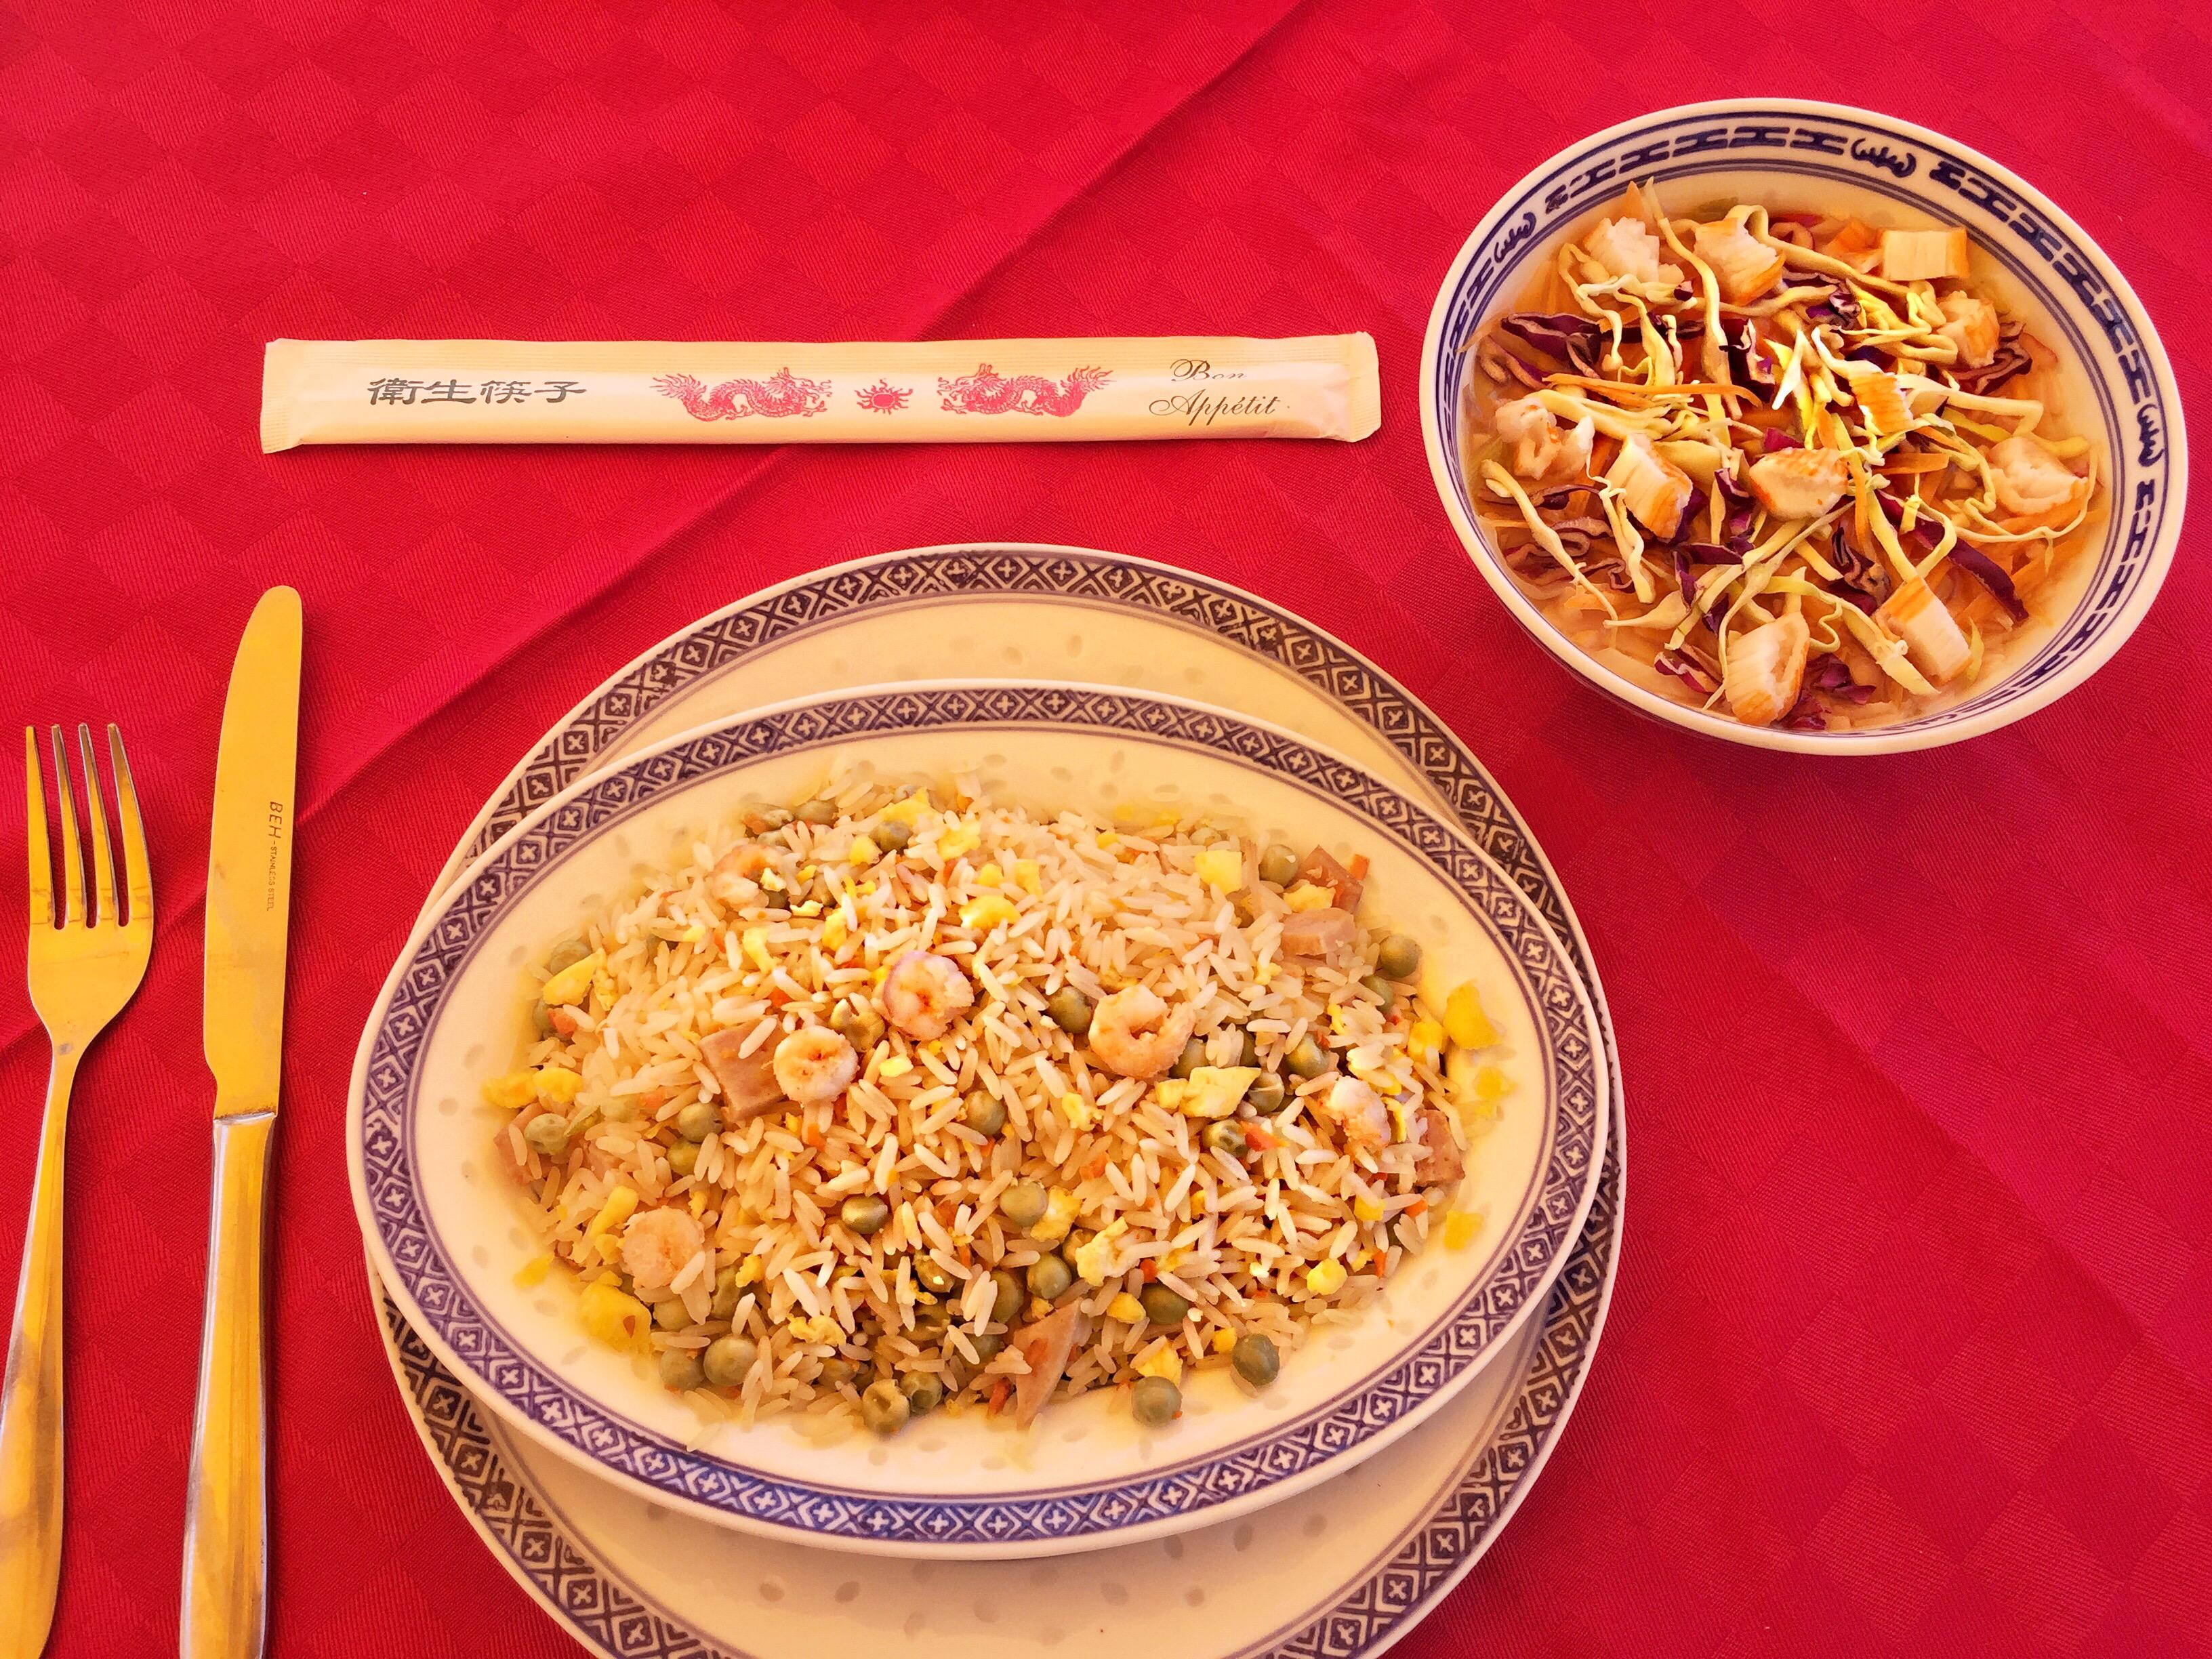 restaurant asiatique à Djerba - Pekin tokyo express